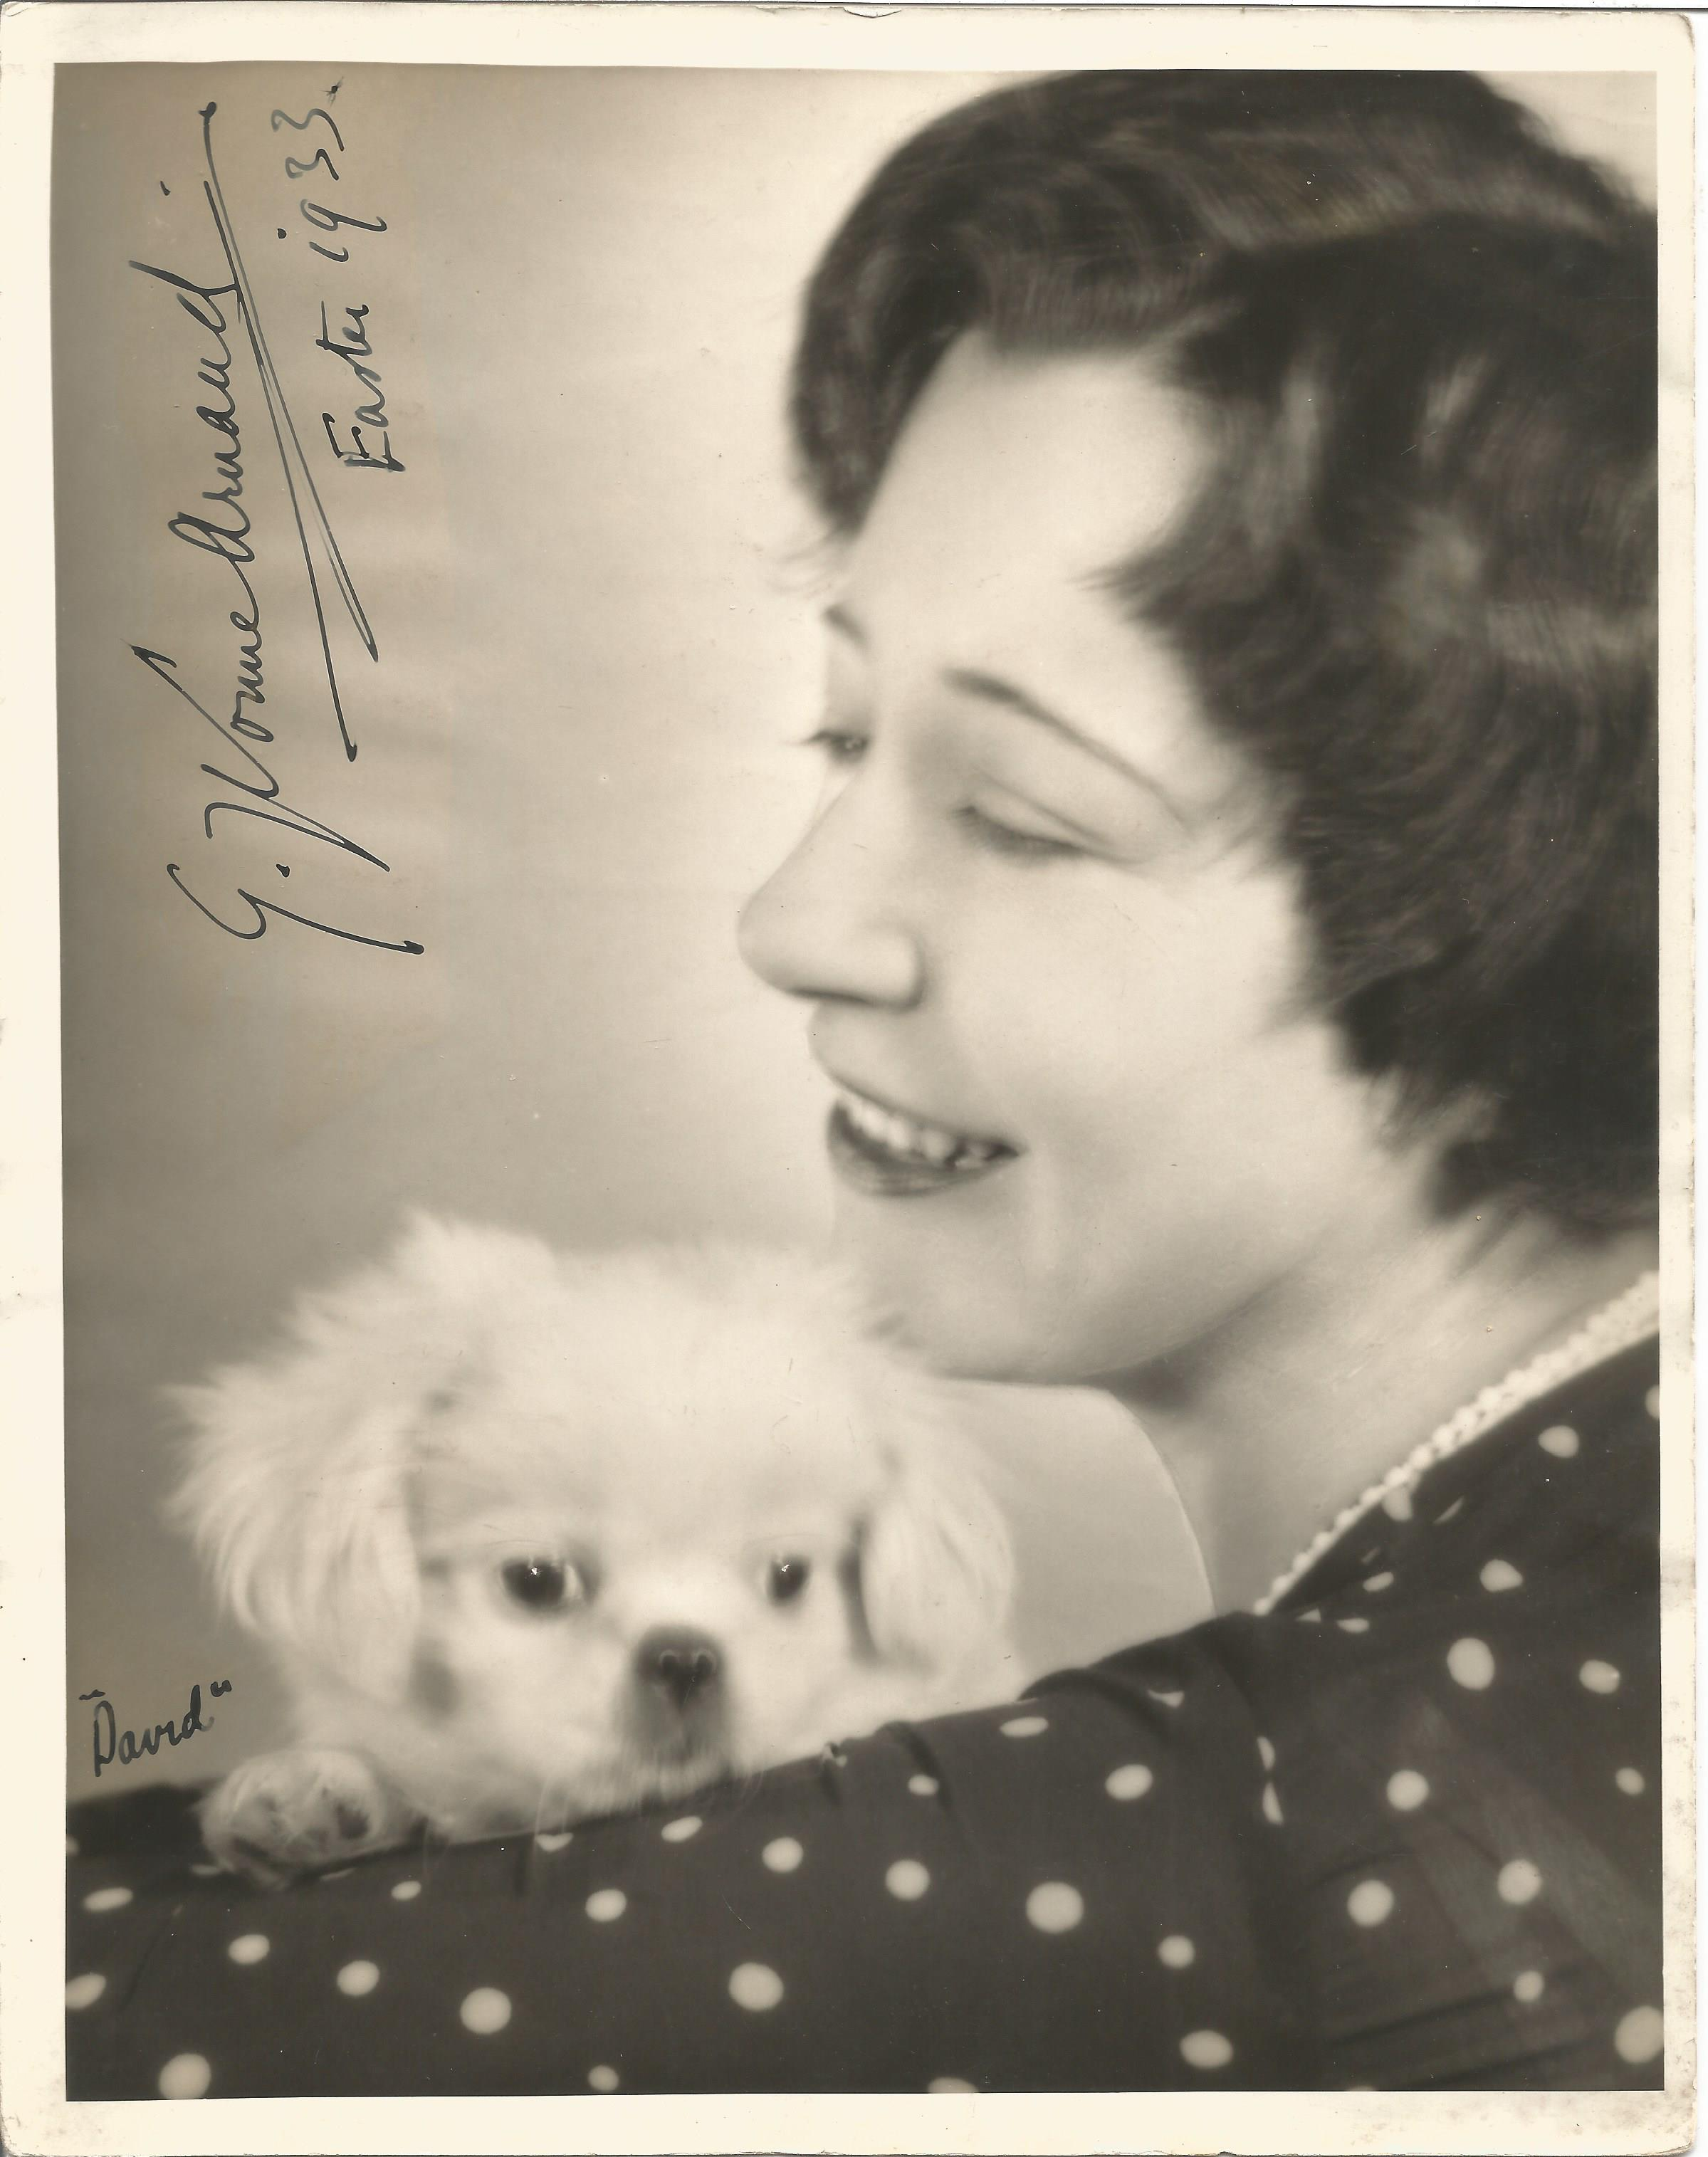 Pianist Yvonne Arnaud signed 10x8 vintage black and white photo dated 1933. Germaine Yvonne Arnaud